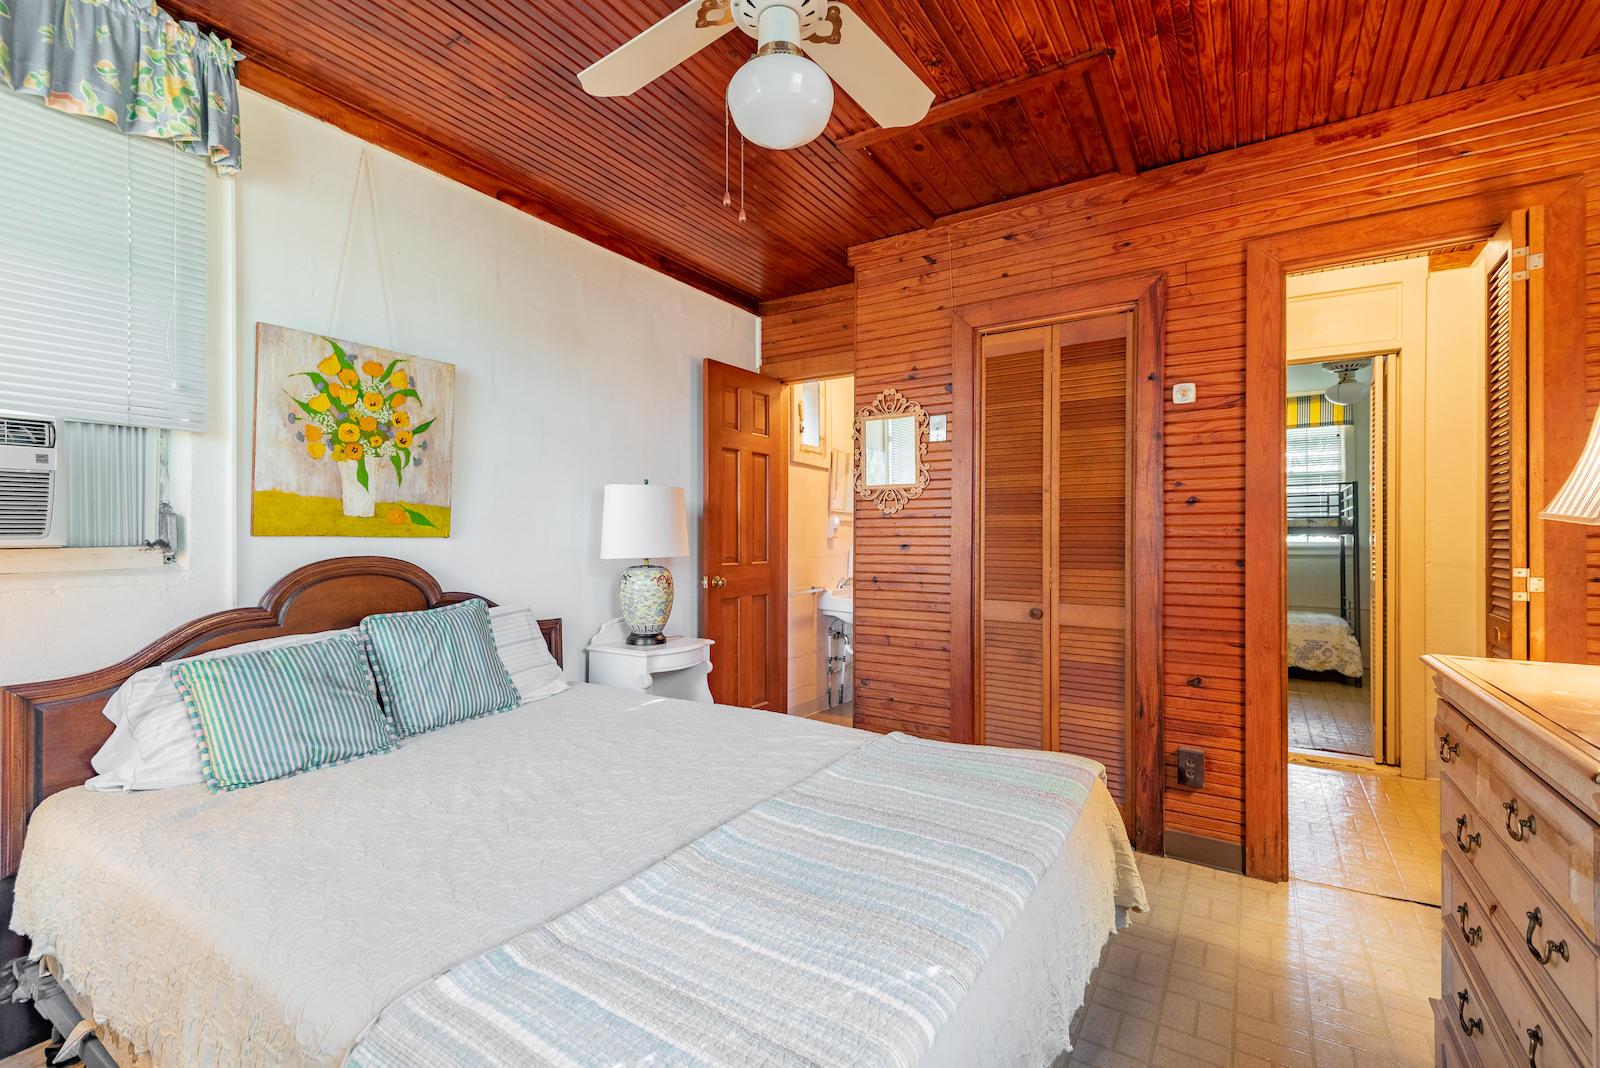 Sullivans Island Homes For Sale - 2525 Atlantic, Sullivans Island, SC - 20